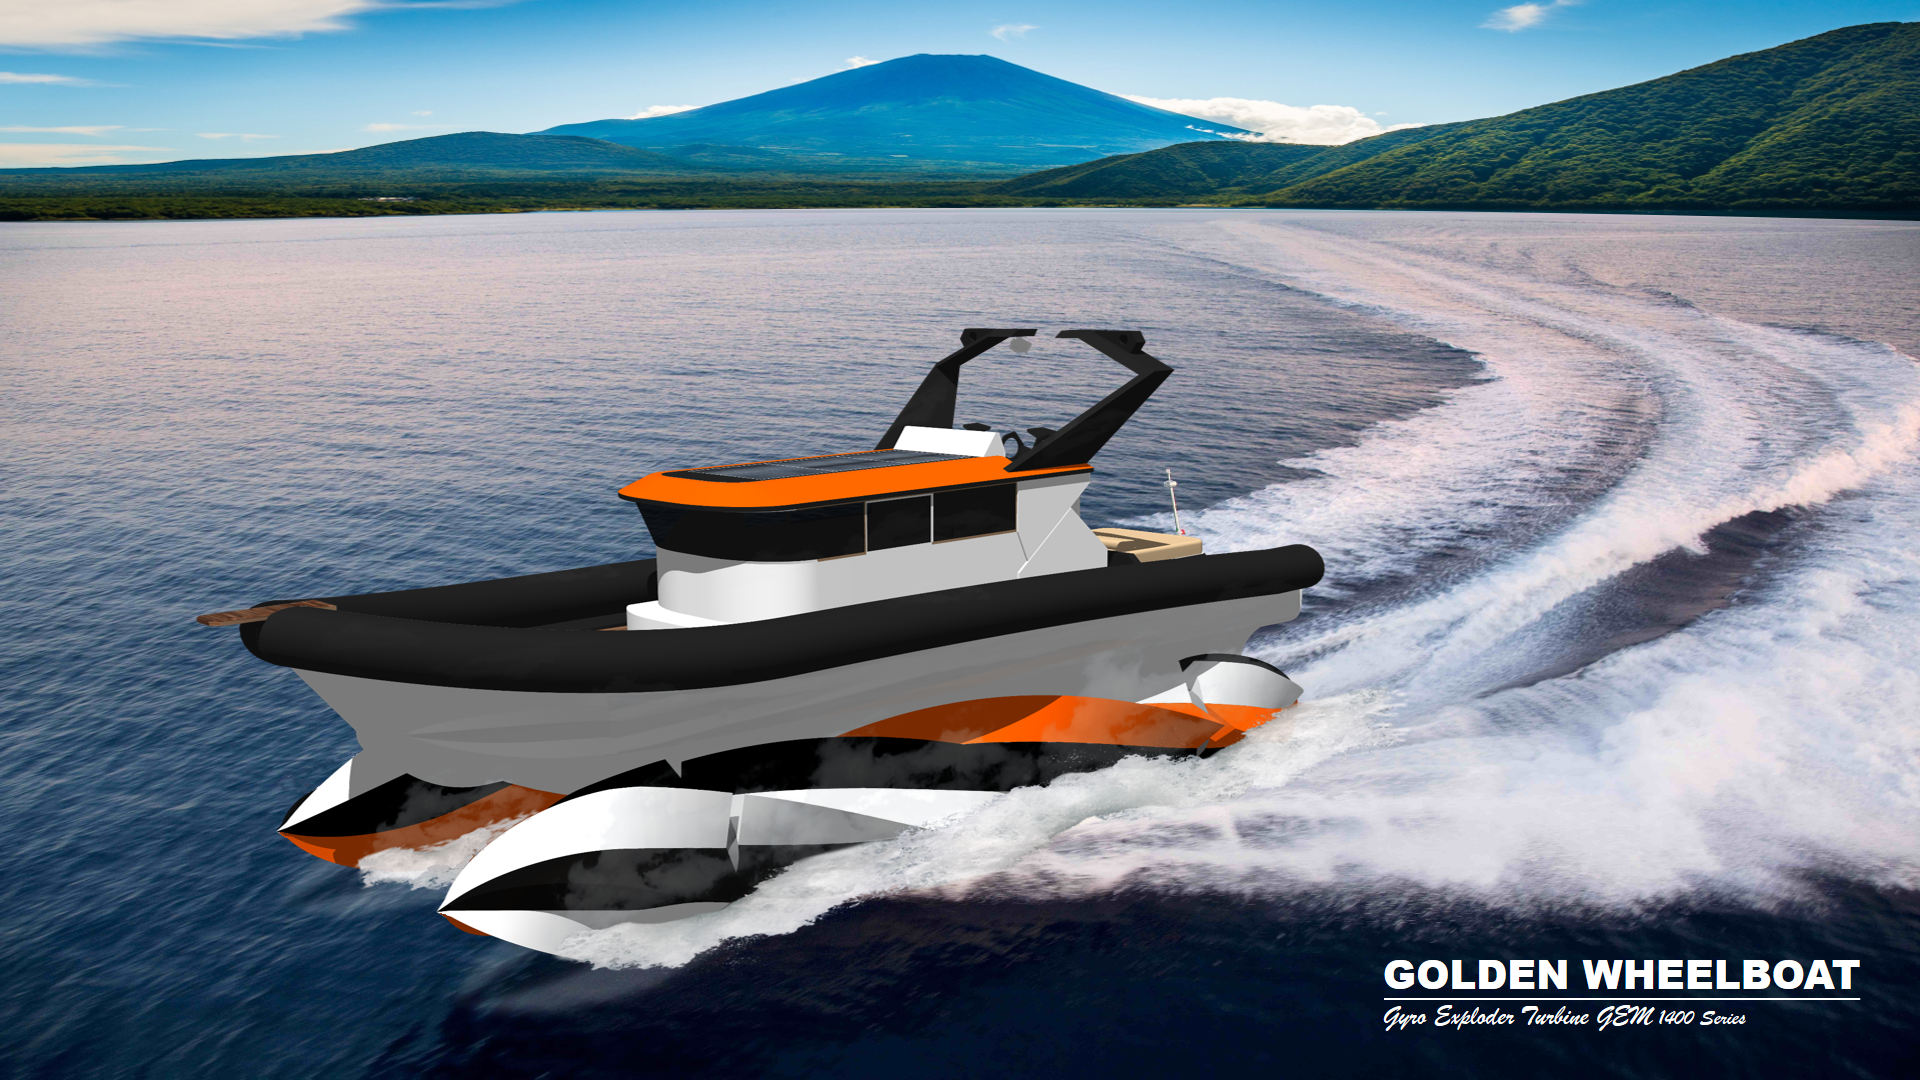 Golden Wheelboat Gyro Exploder Turbine GEM 1400 Series IMG1